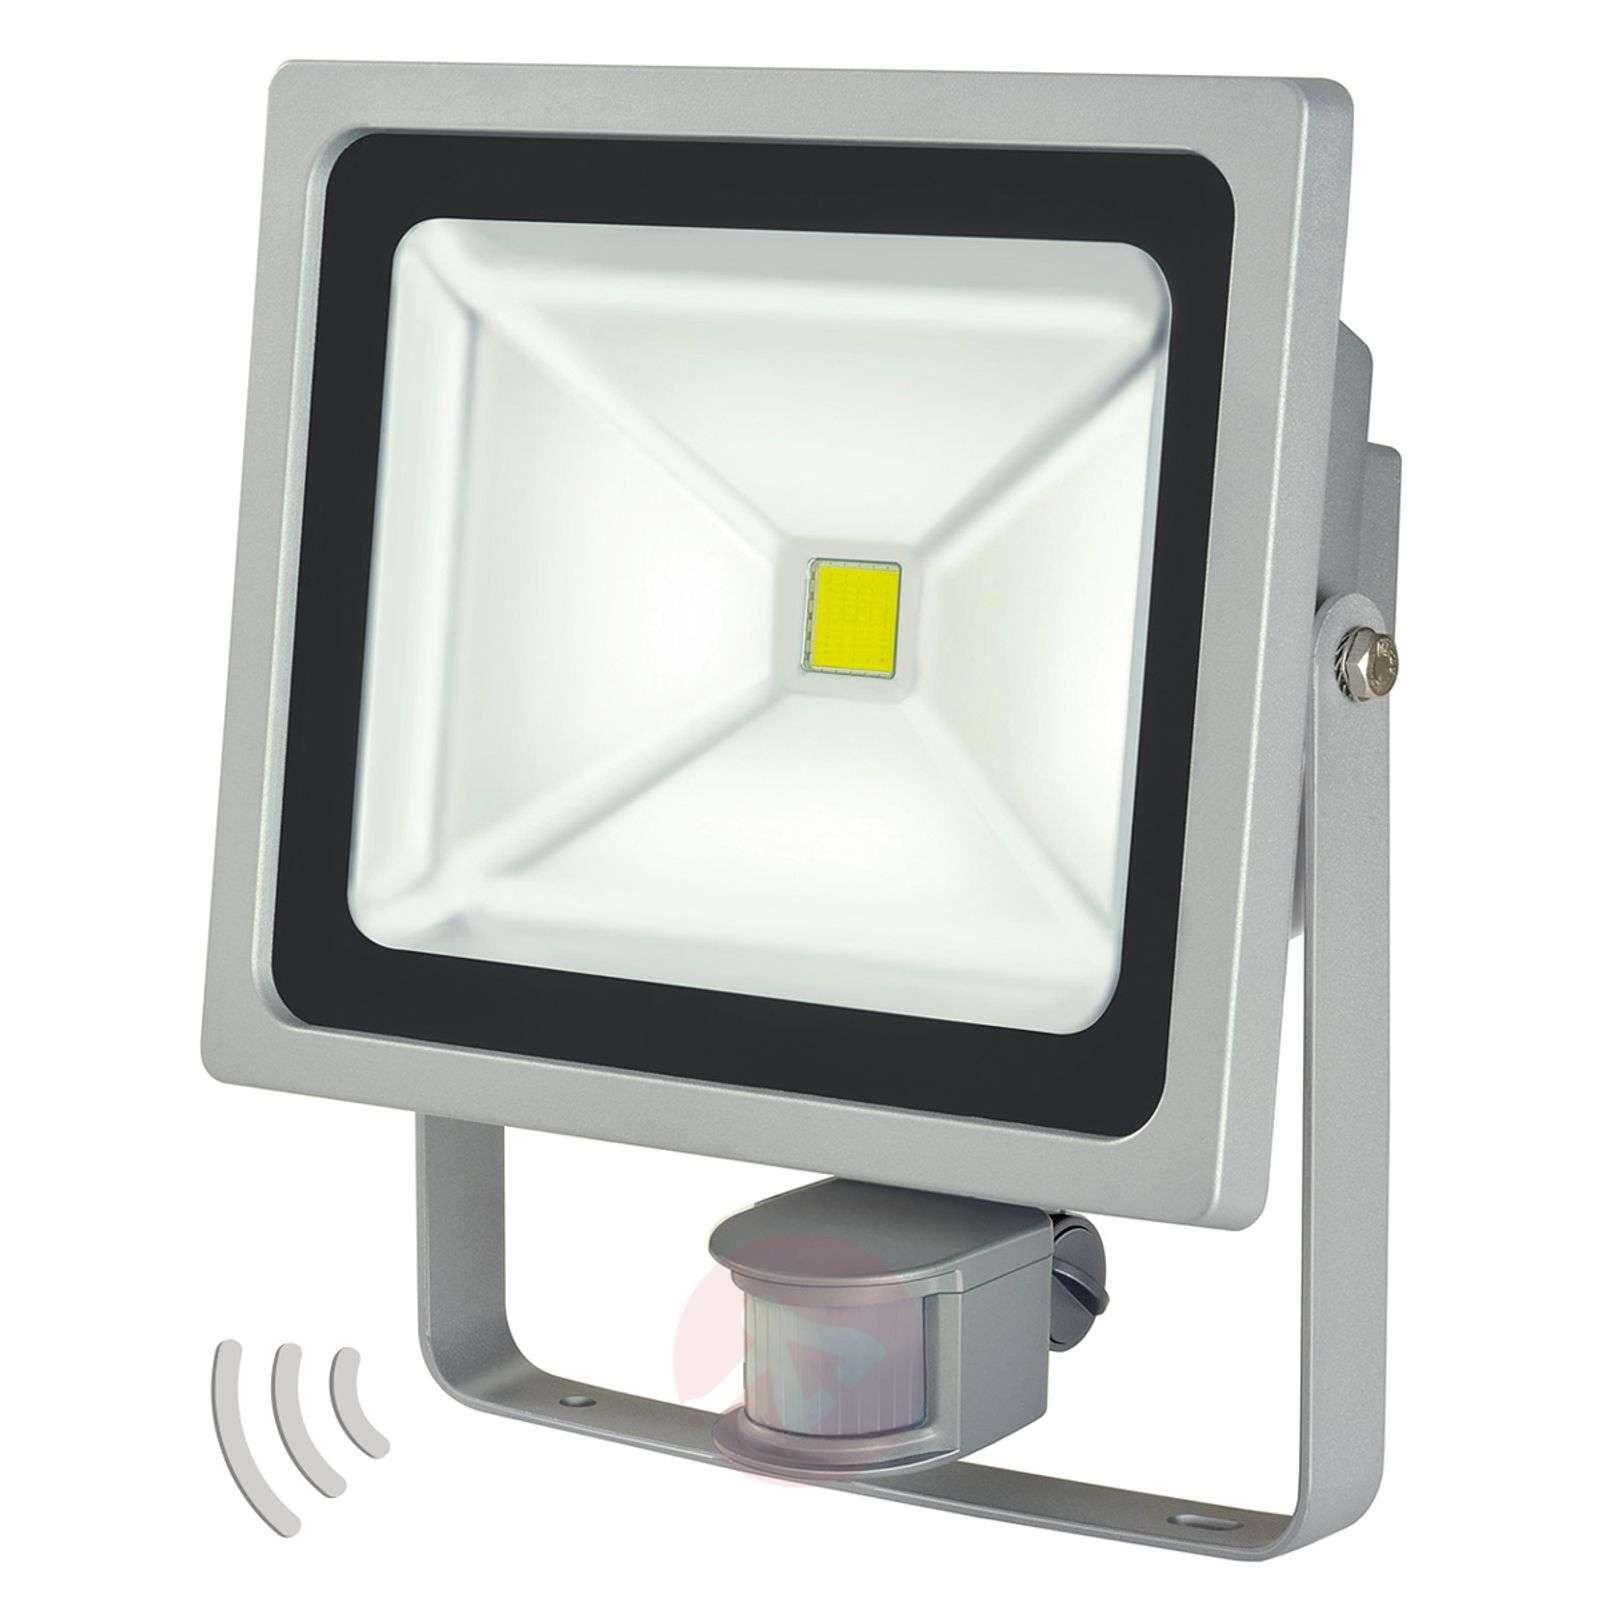 L CN 150 LED outdoor wall spotlight, sensor, 50W-1540189-02